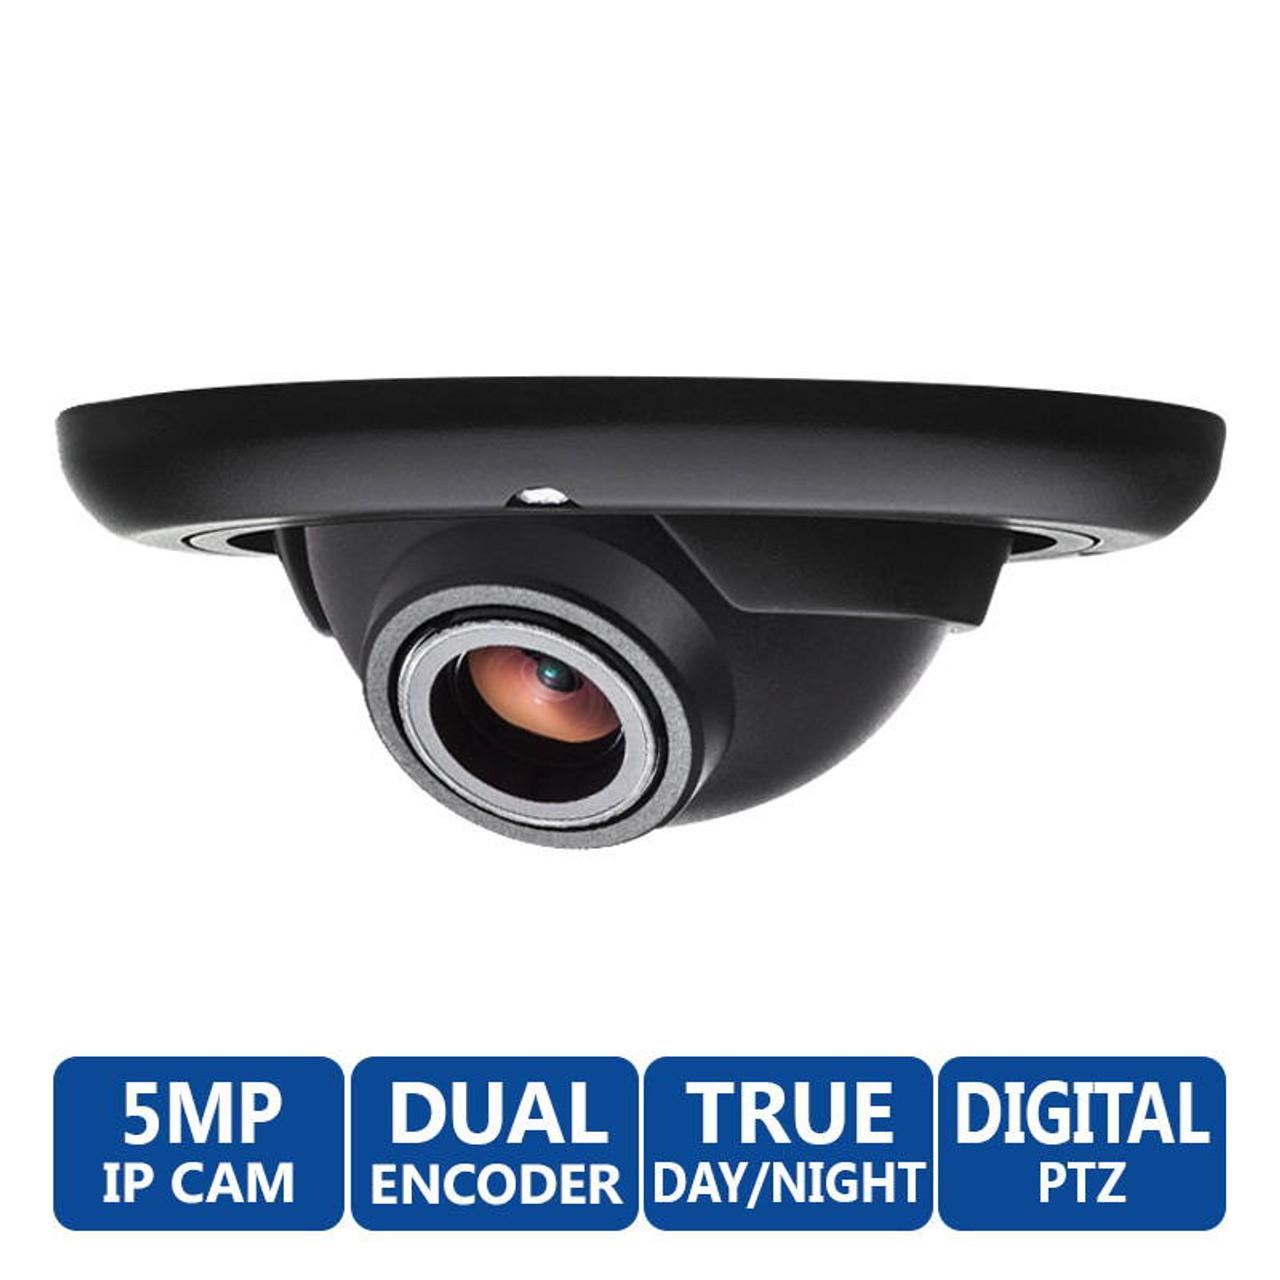 ARECONT VISION AV3245PM-B-LG IP CAMERA DRIVERS DOWNLOAD